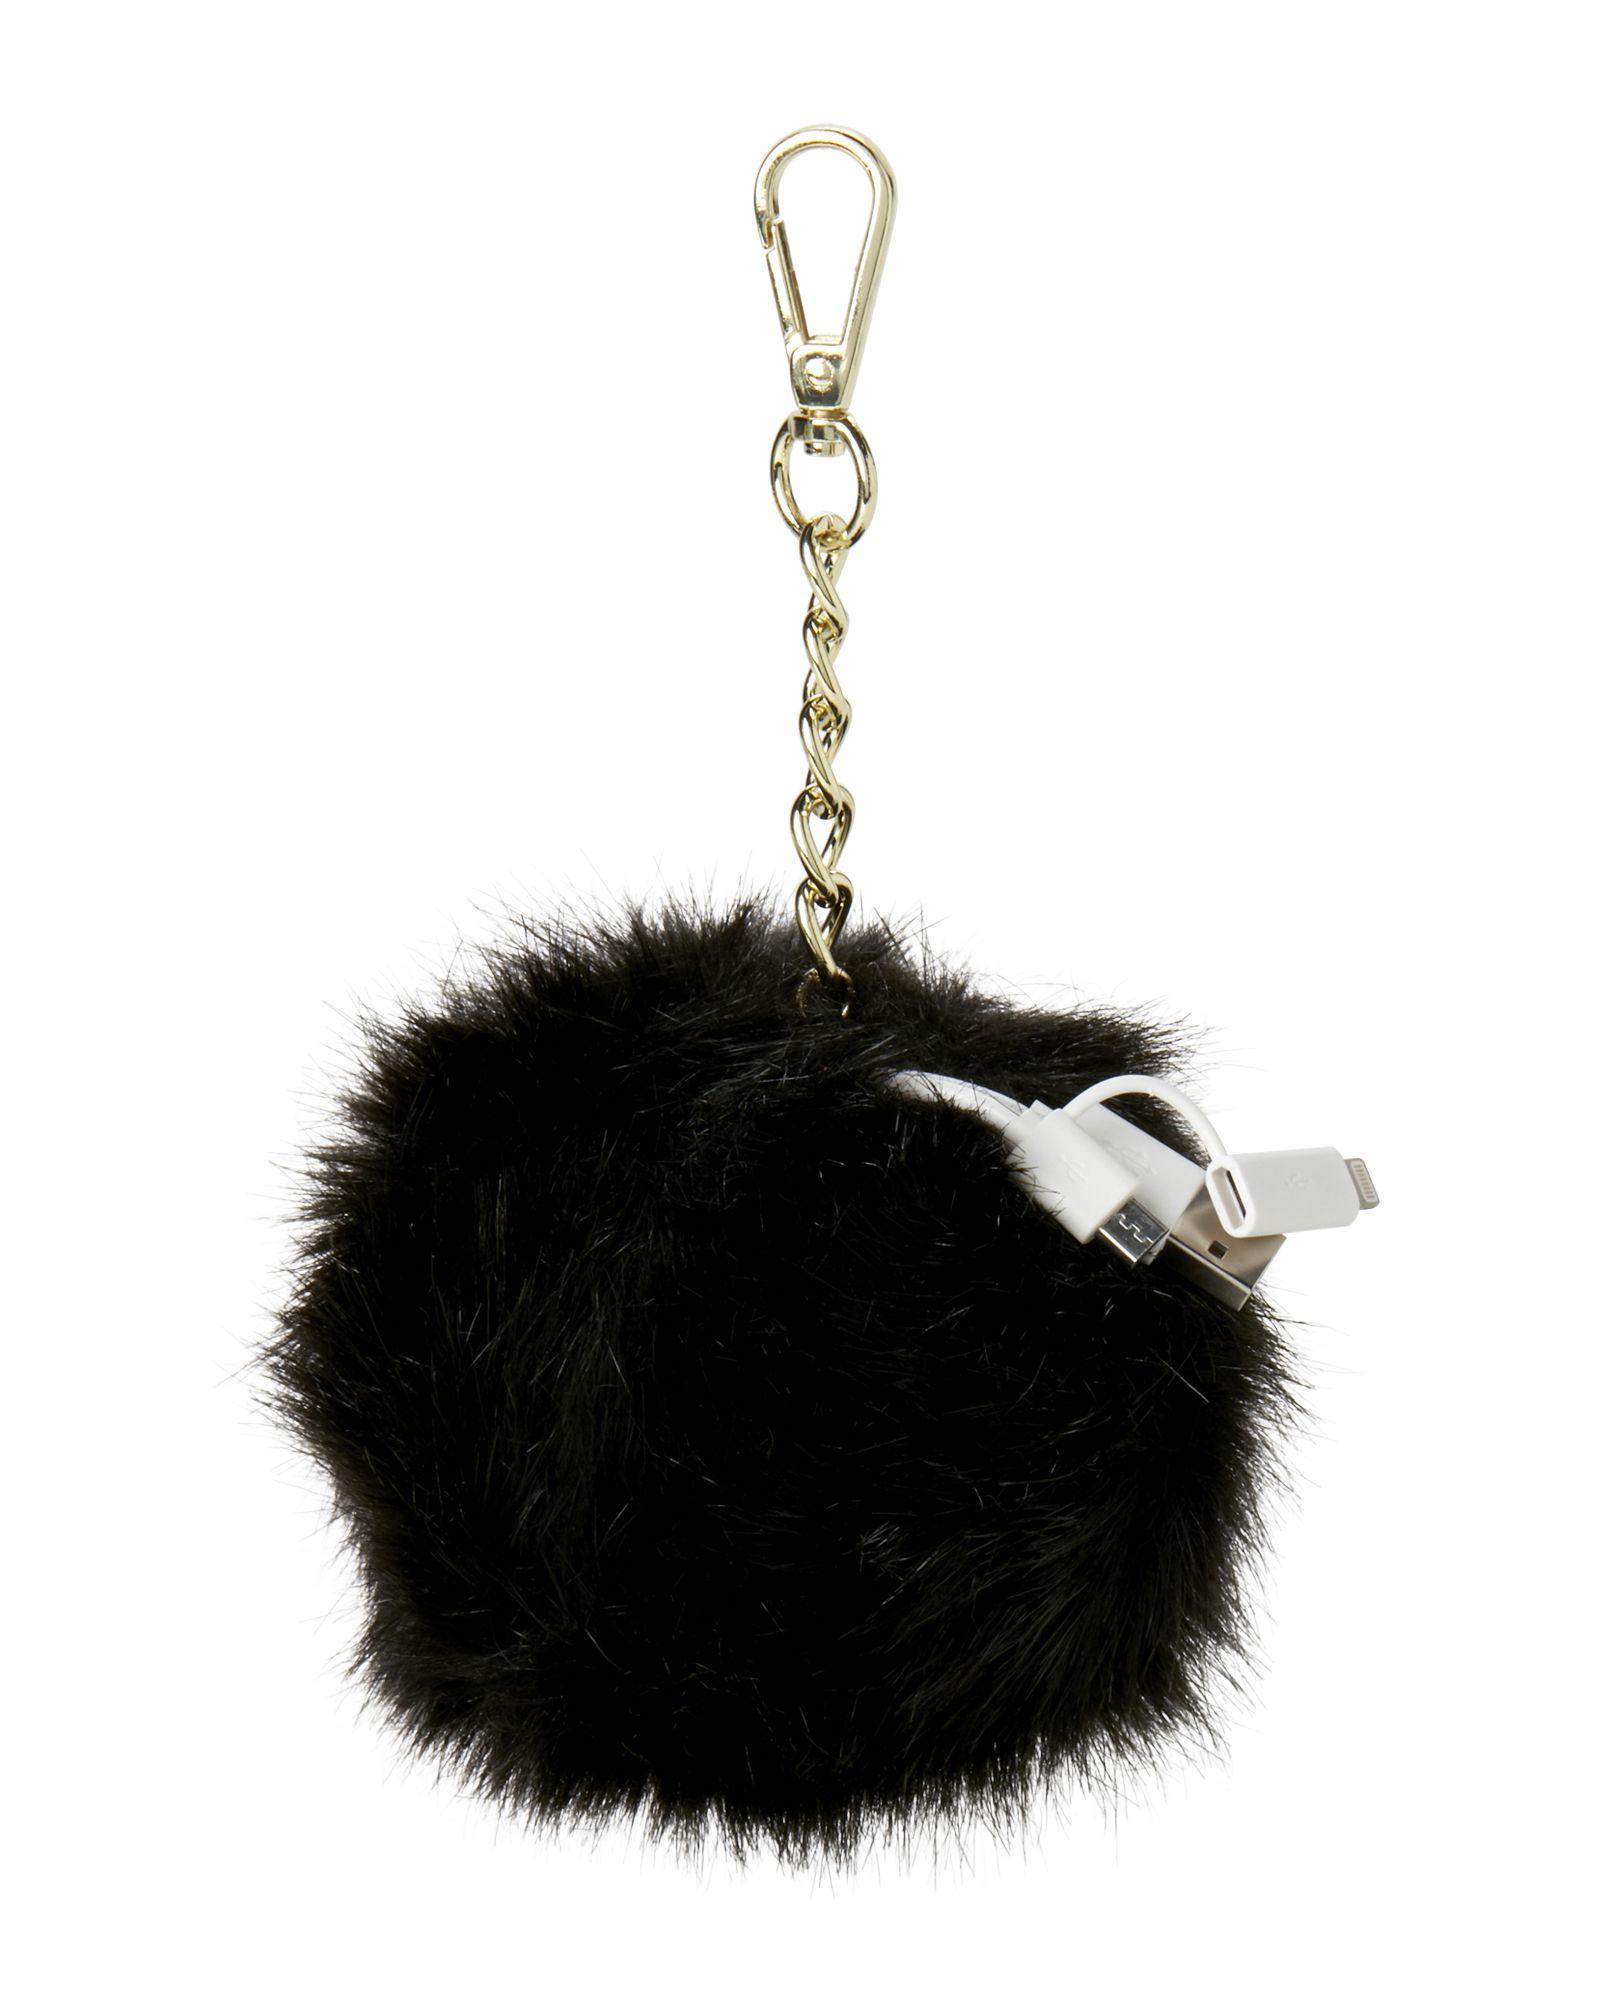 fabb0bb5eda6 Jade   Deer Black Pom-Pom Bag Charm Portable Charger